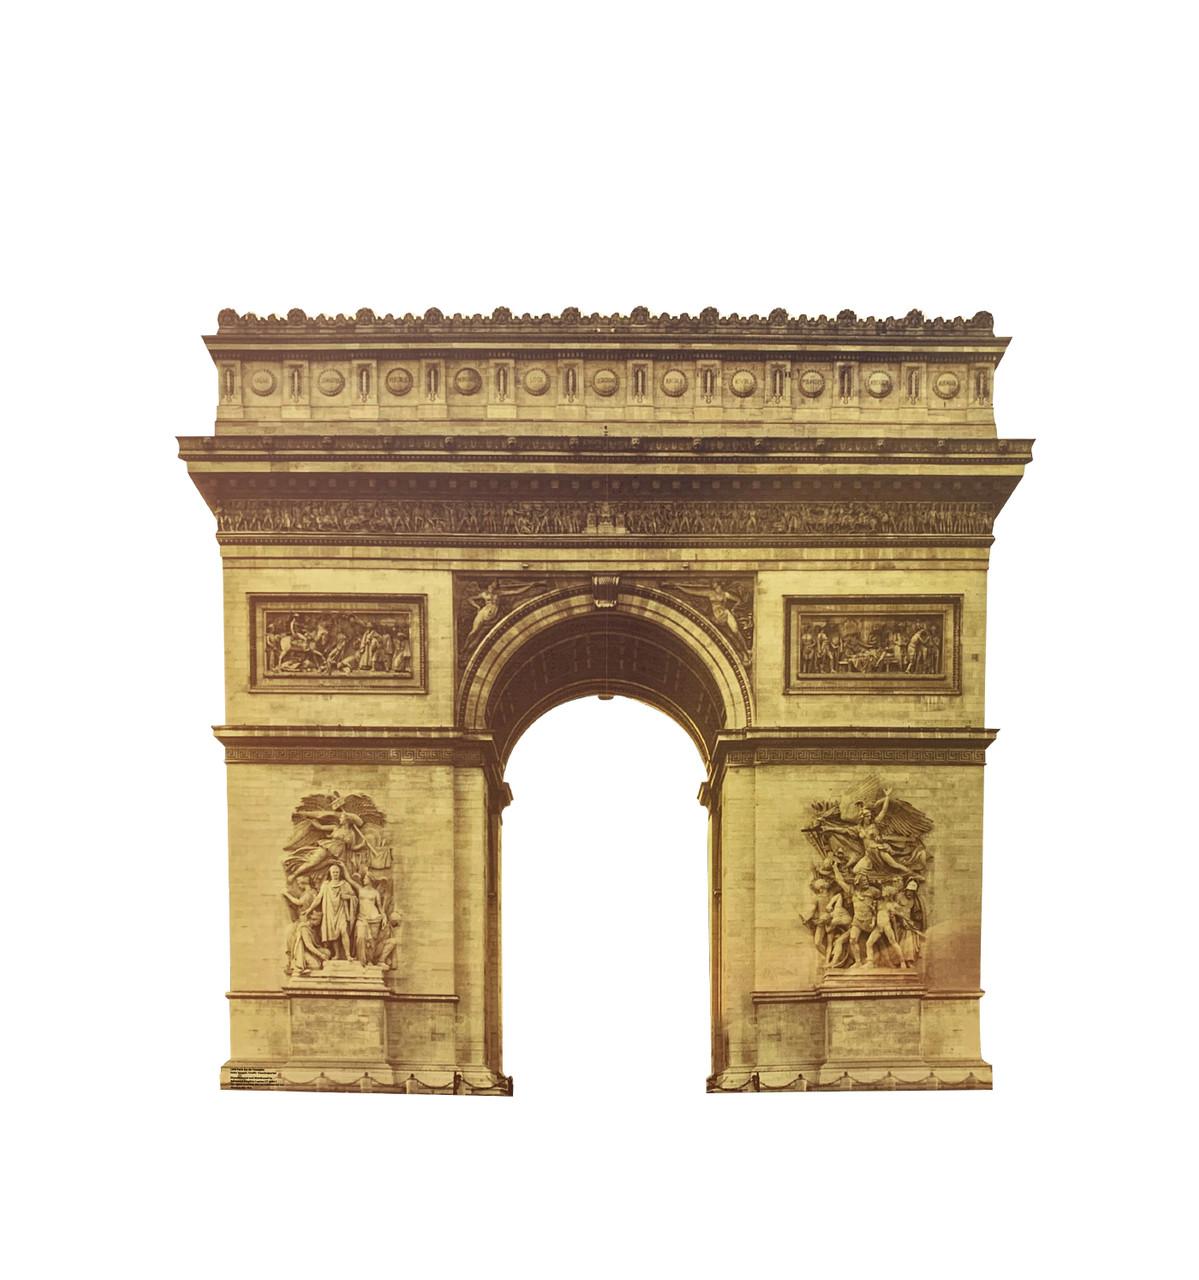 Cardboard standee of the Paris Arc de Triomphe.